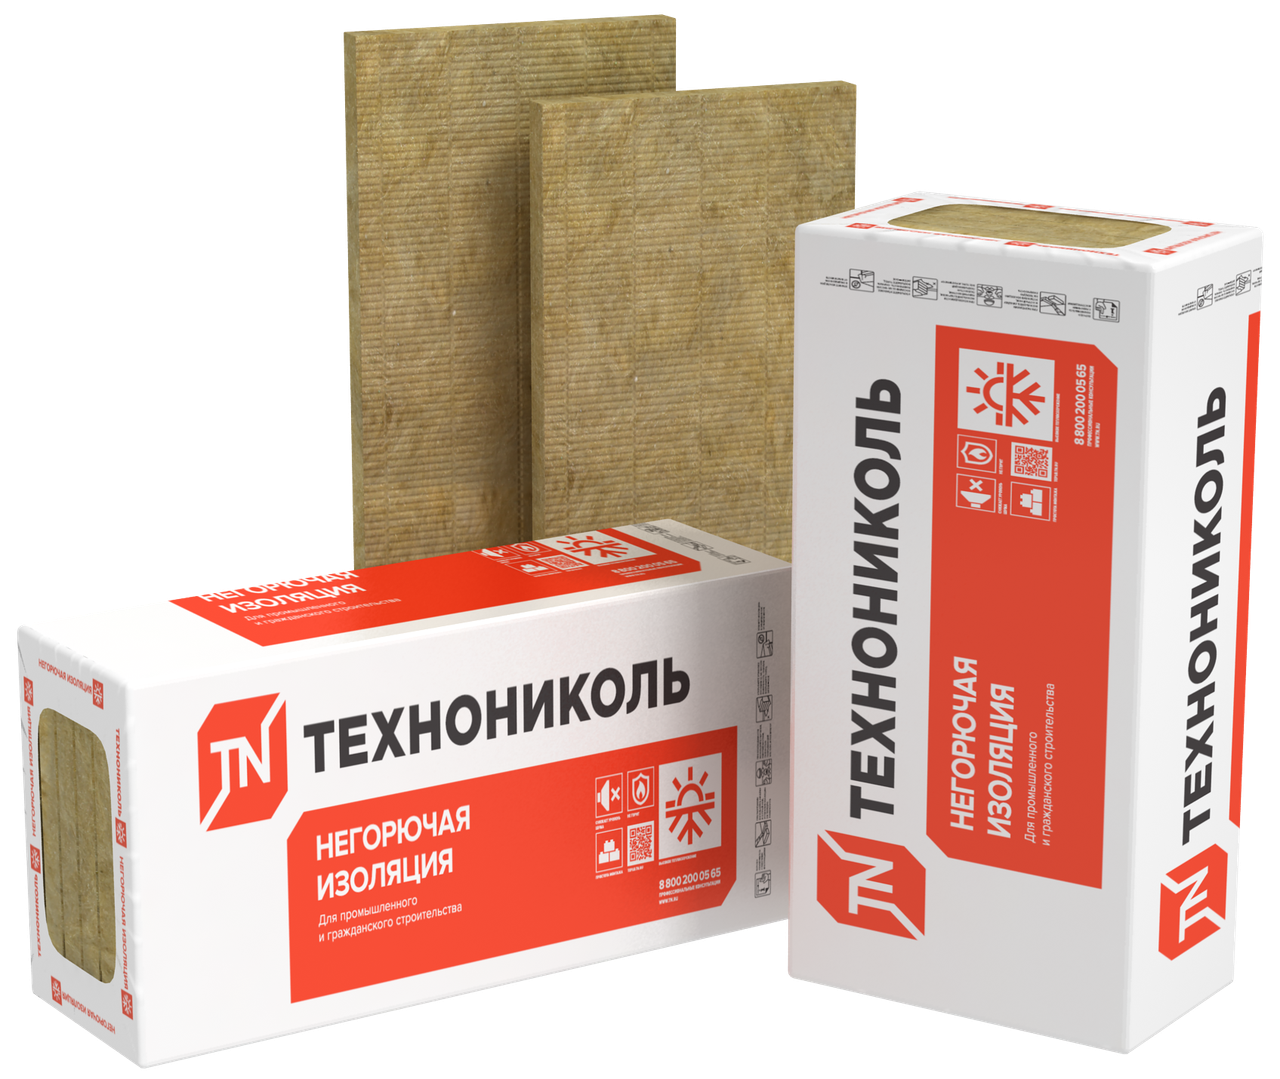 Вата мінеральна Sweetondale Техноруф В Екстра, 175 кг/куб.м 110 мм